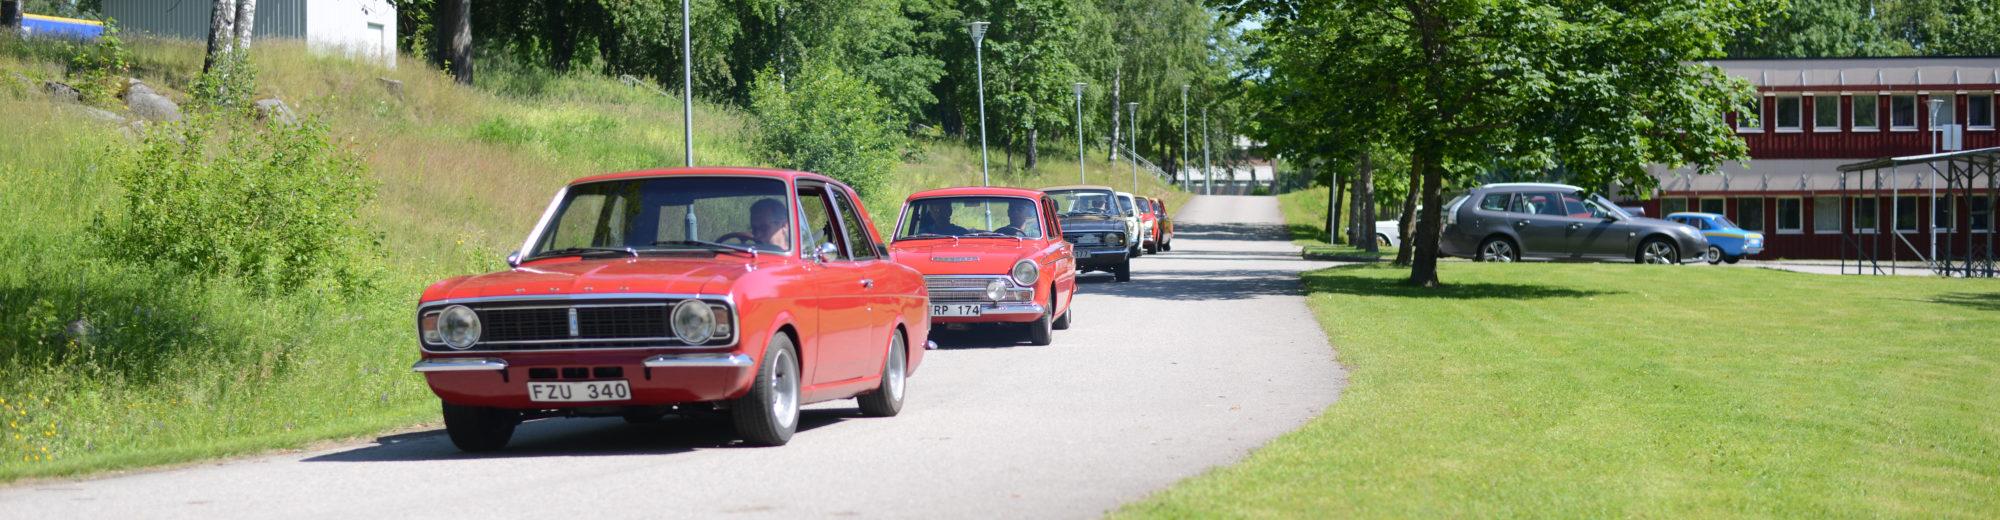 Svenska Ford Cortina-klubben